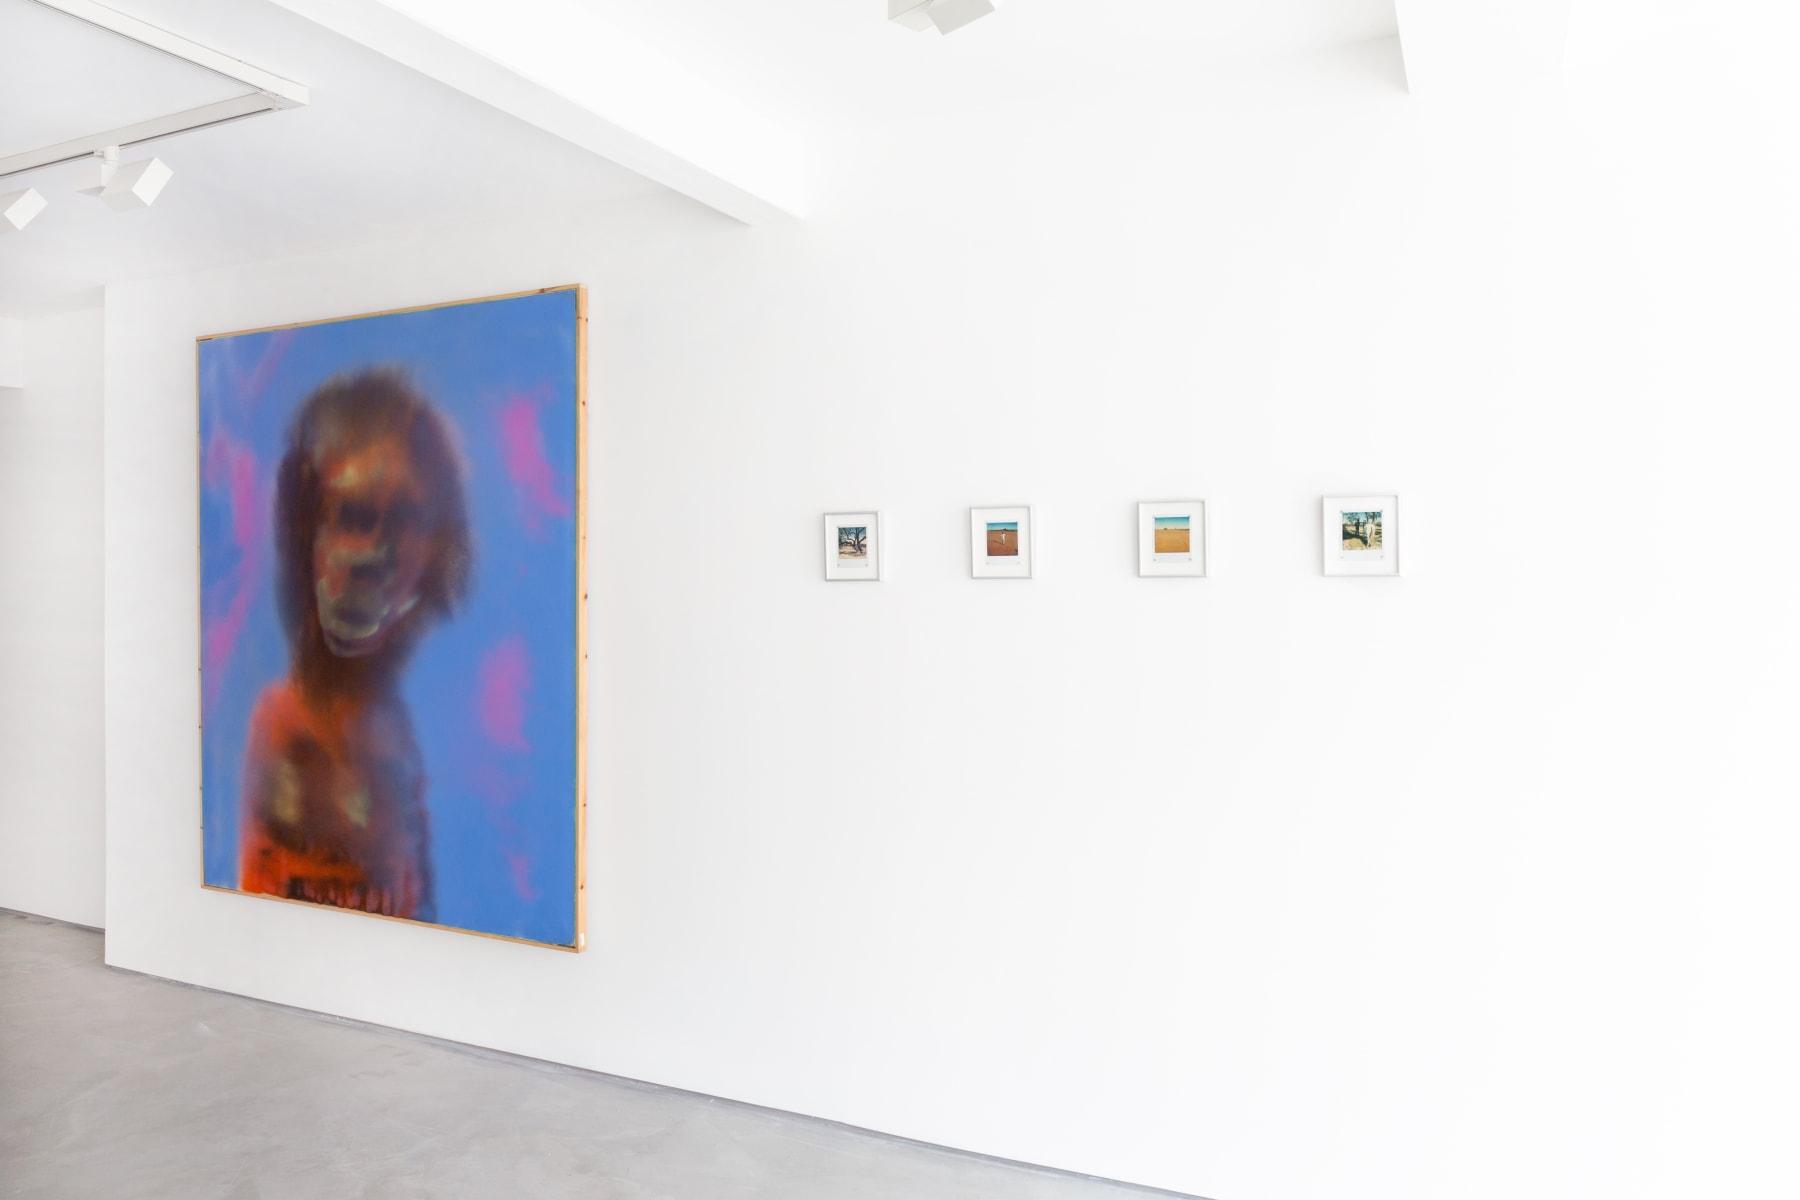 Sir Sidney Nolan - Polaroids, Informality, Installation view 2021